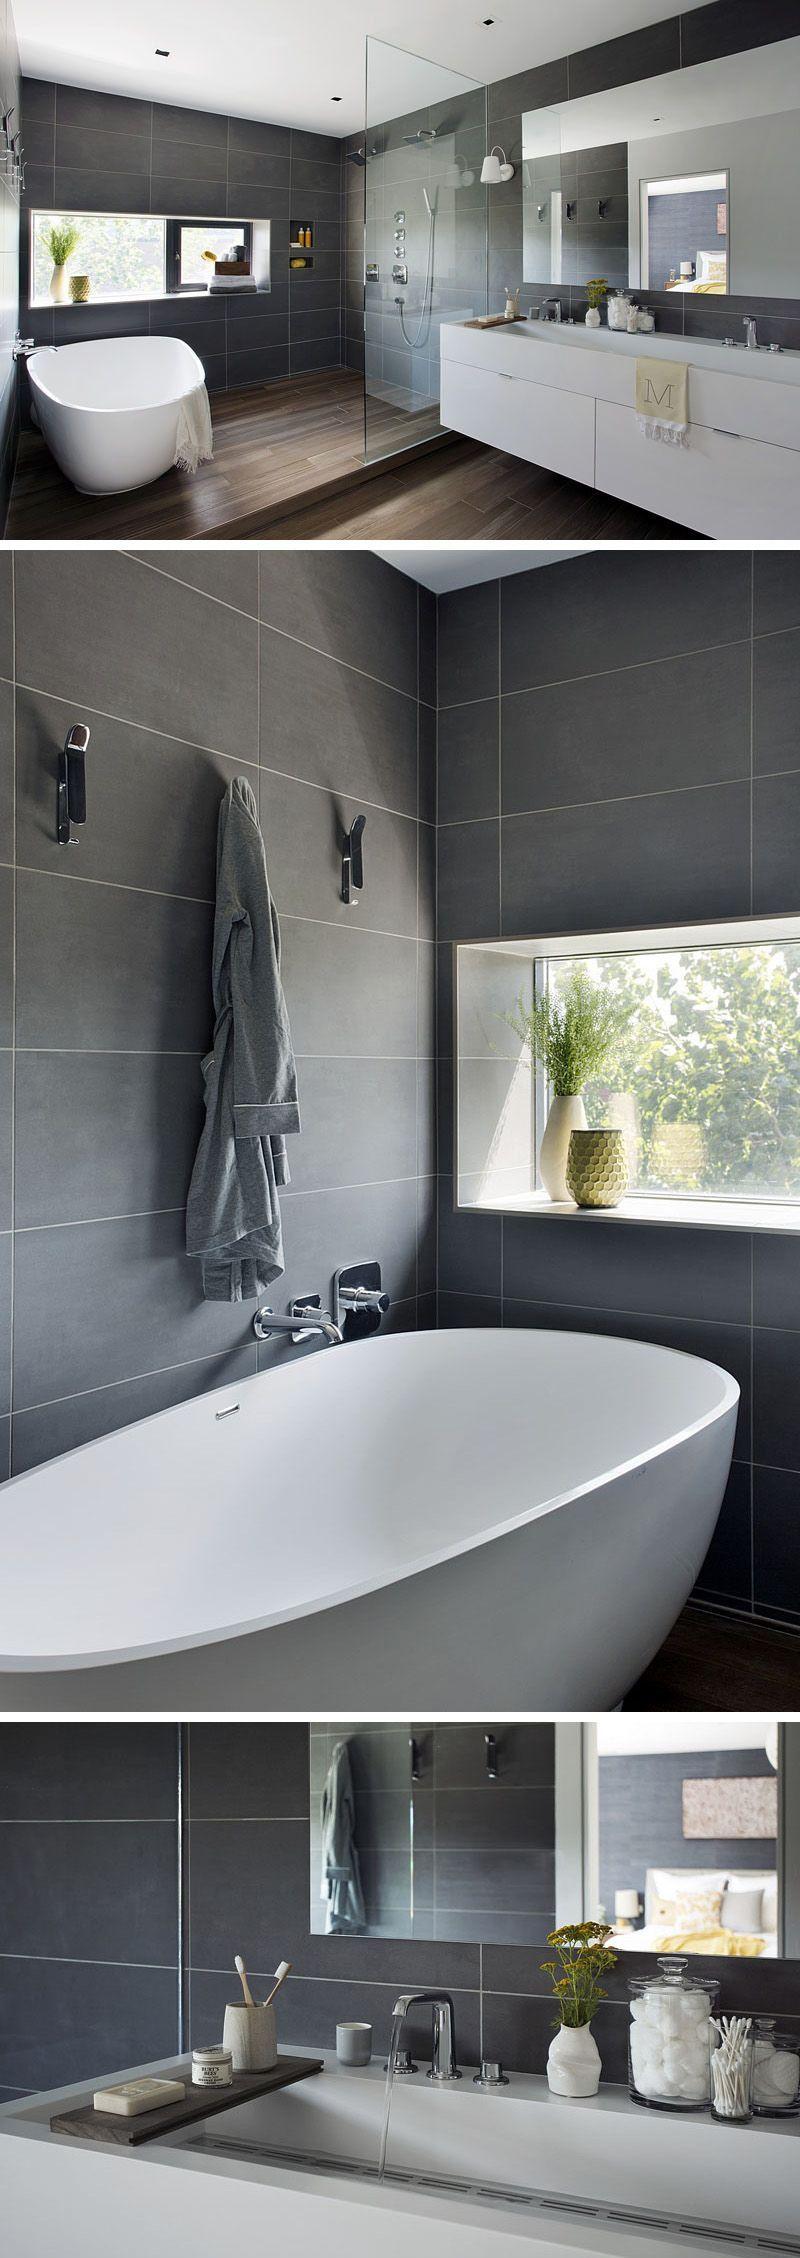 Large dark grey rectangular tiles and wood